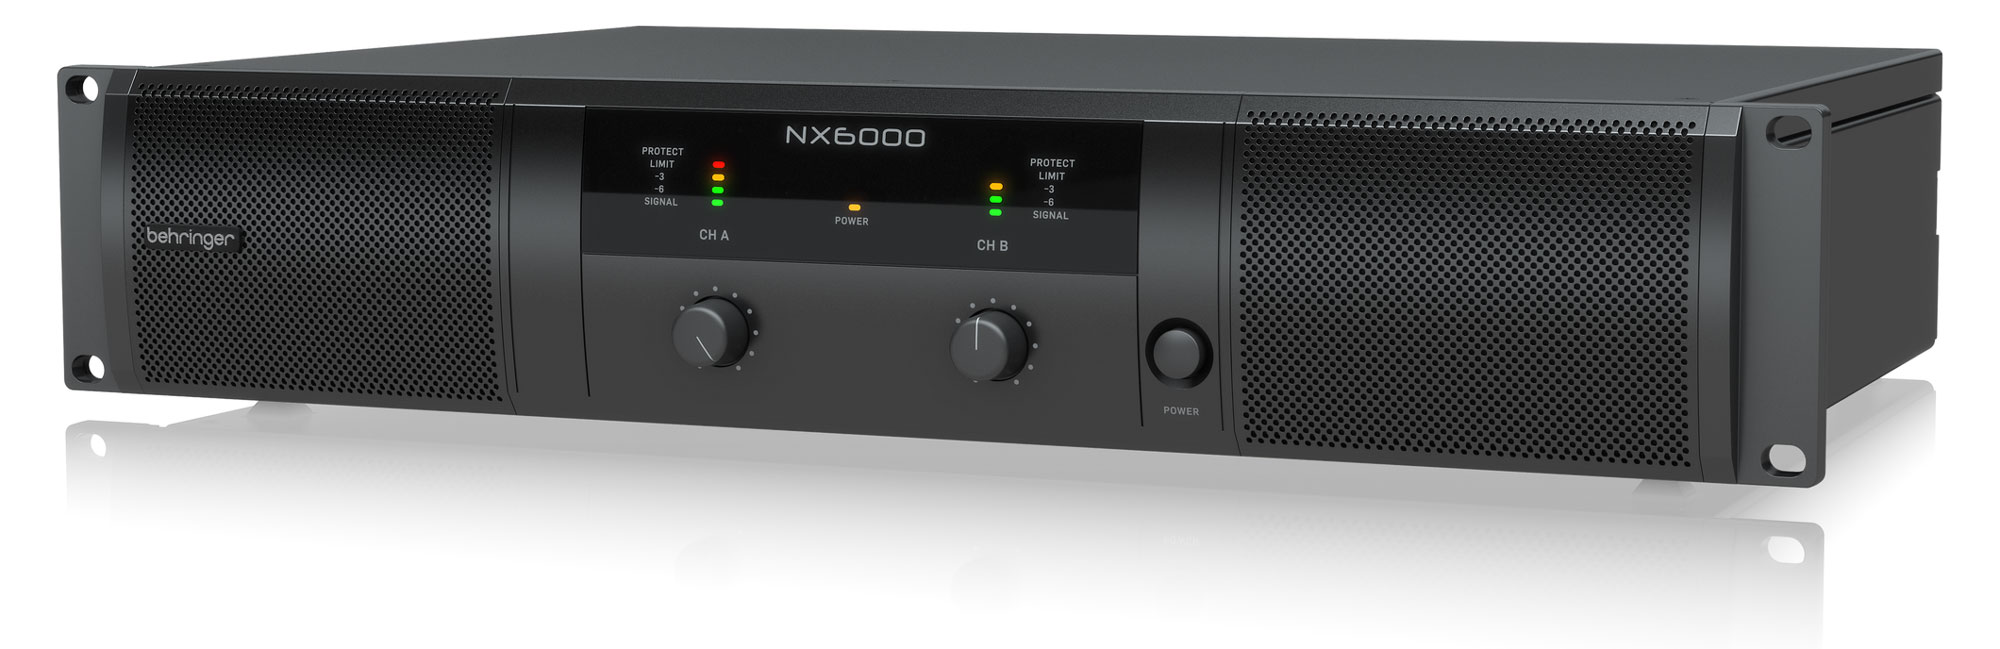 Paendstufen - Behringer NX6000 Endstufe - Onlineshop Musikhaus Kirstein